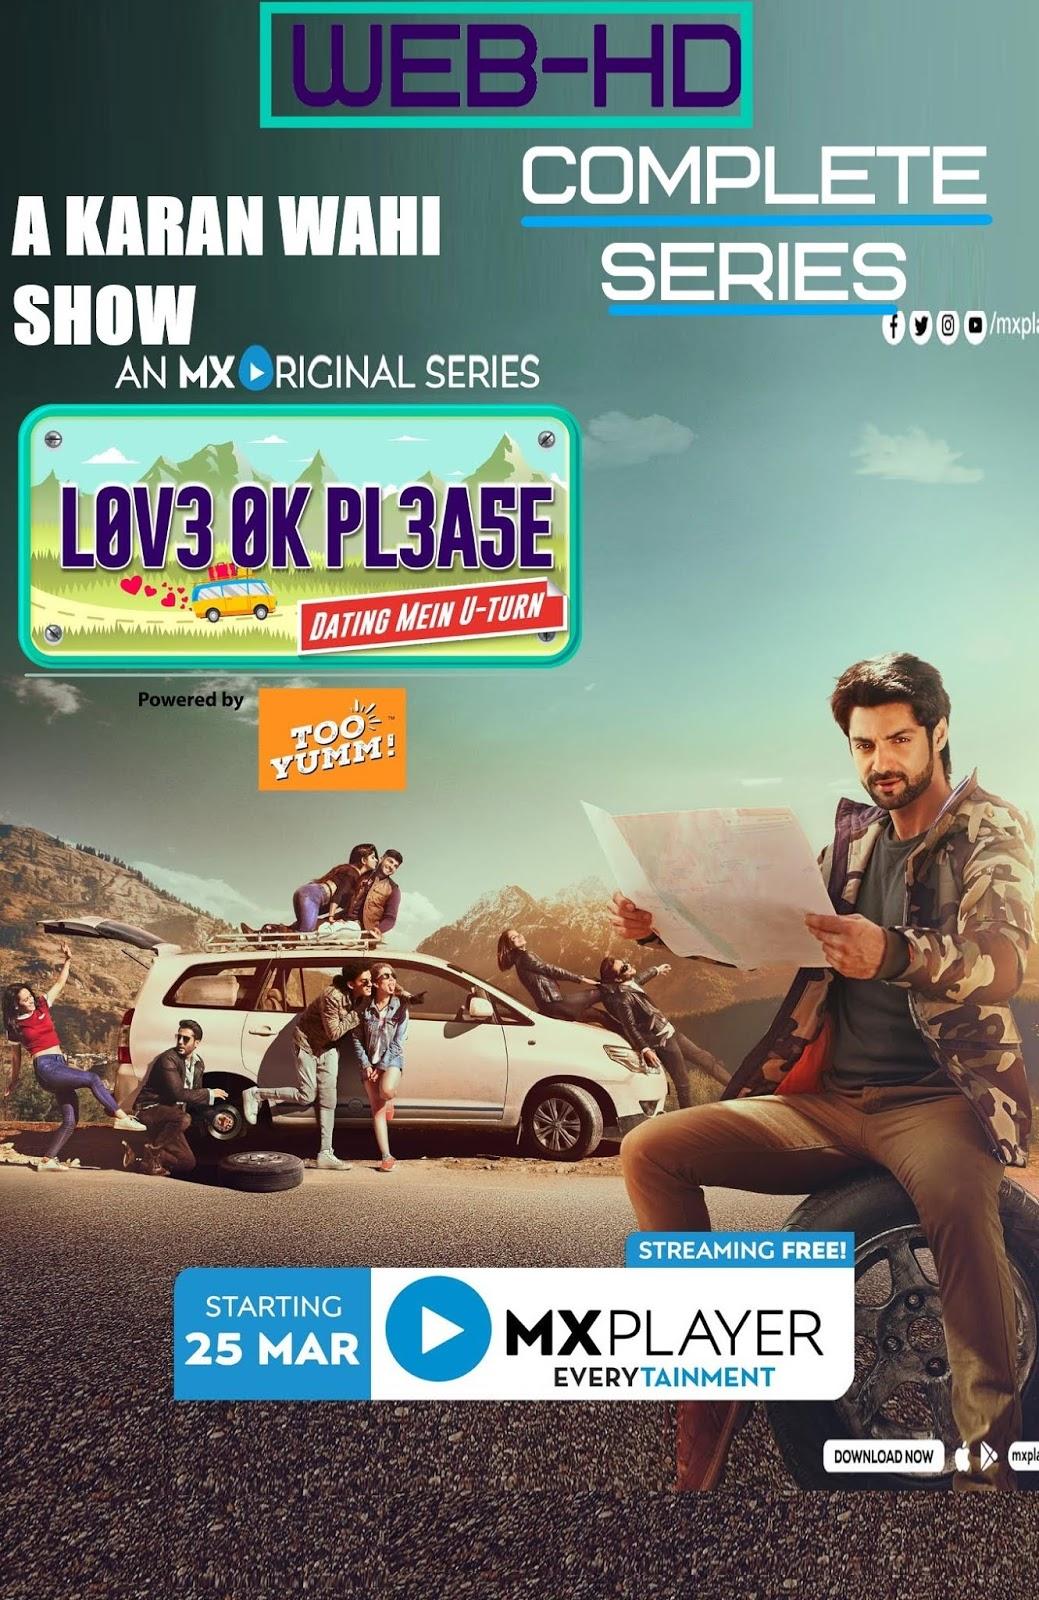 Love Ok Please Season 1 download 480p, Love Ok Please Season 1 download 720p, Love Ok Please Season 1 download 300mb, Love Ok Please Season 1 download free